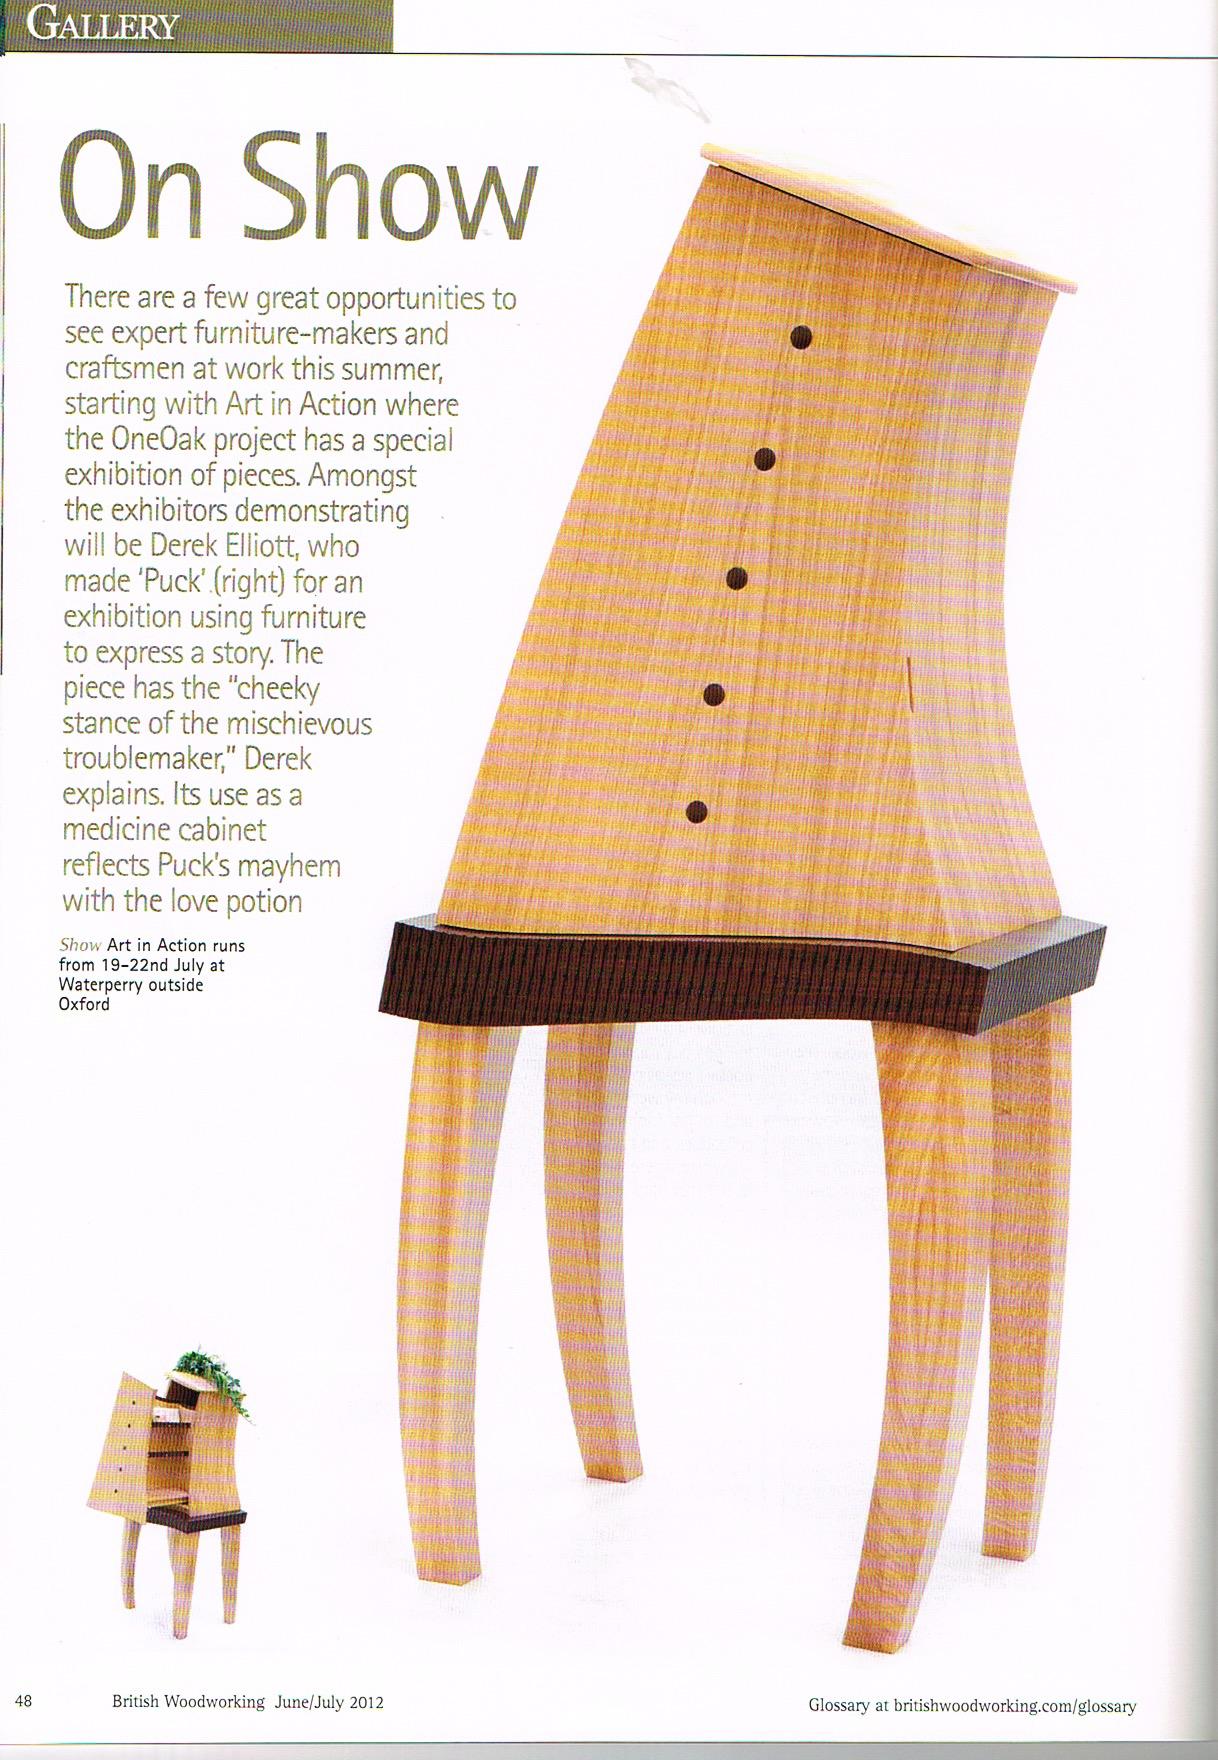 British Woodworking. June 2012